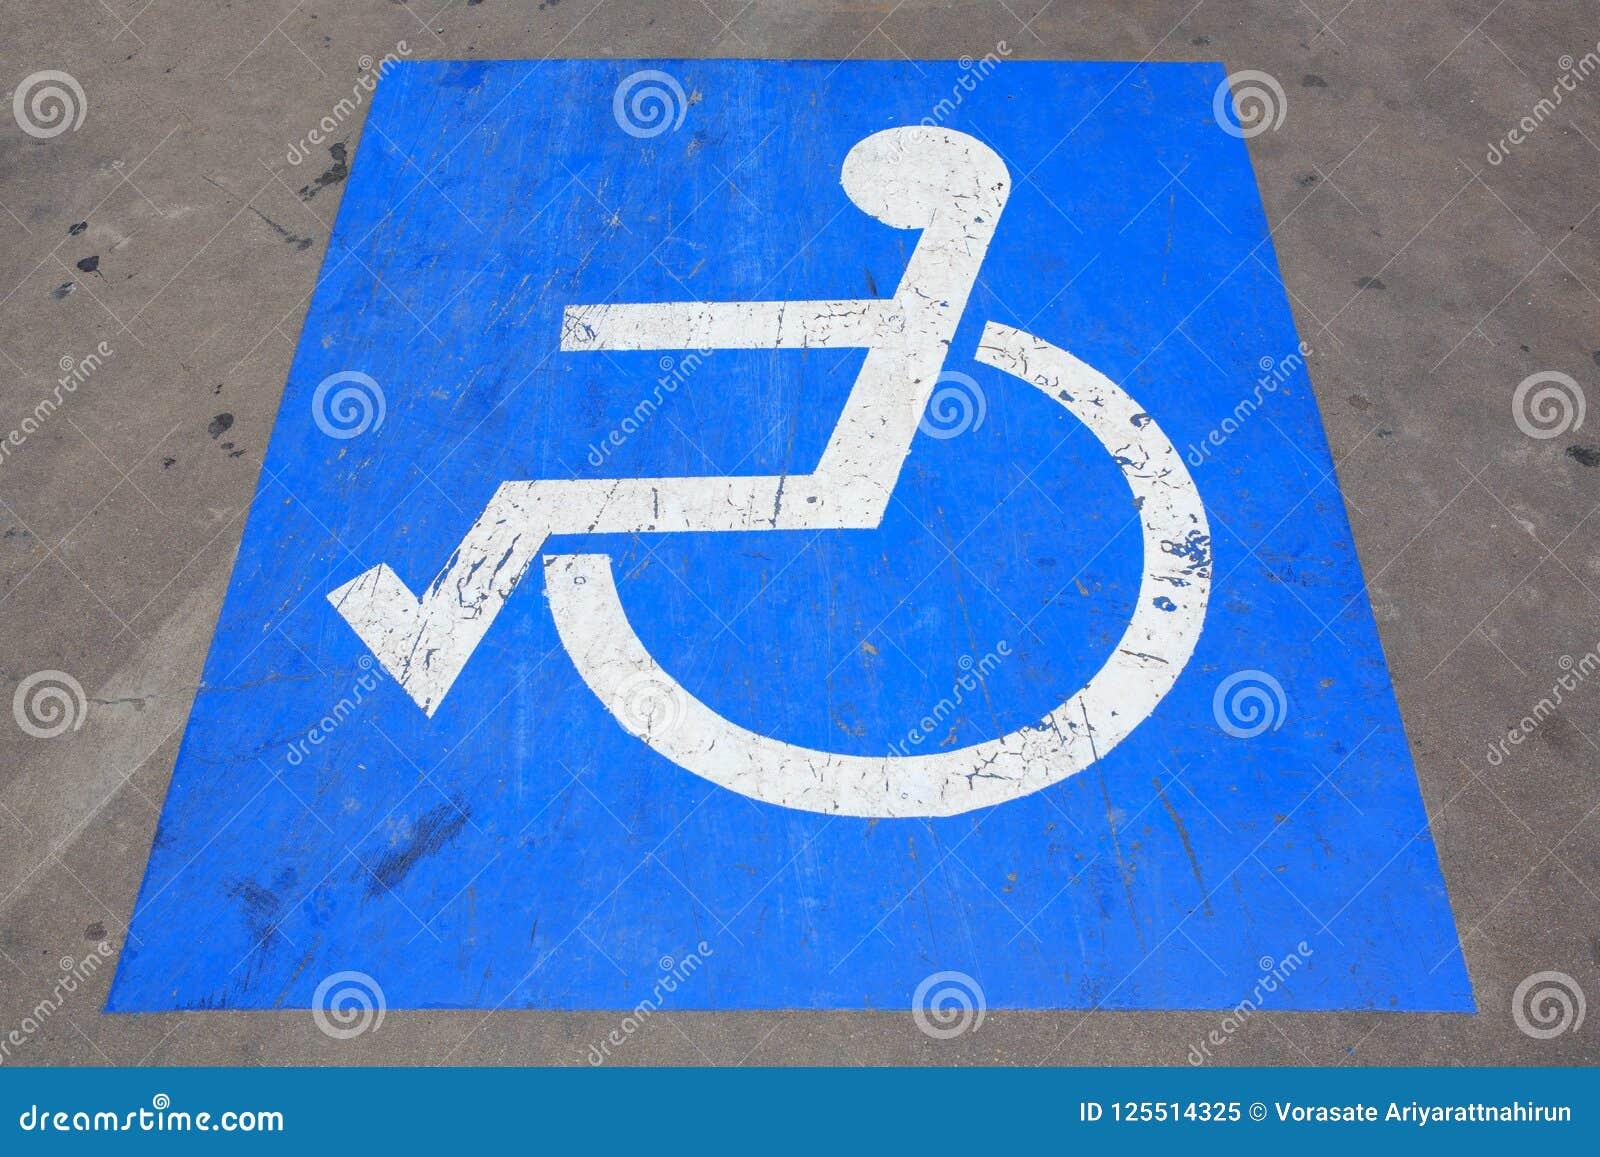 mva application for handicap sticker